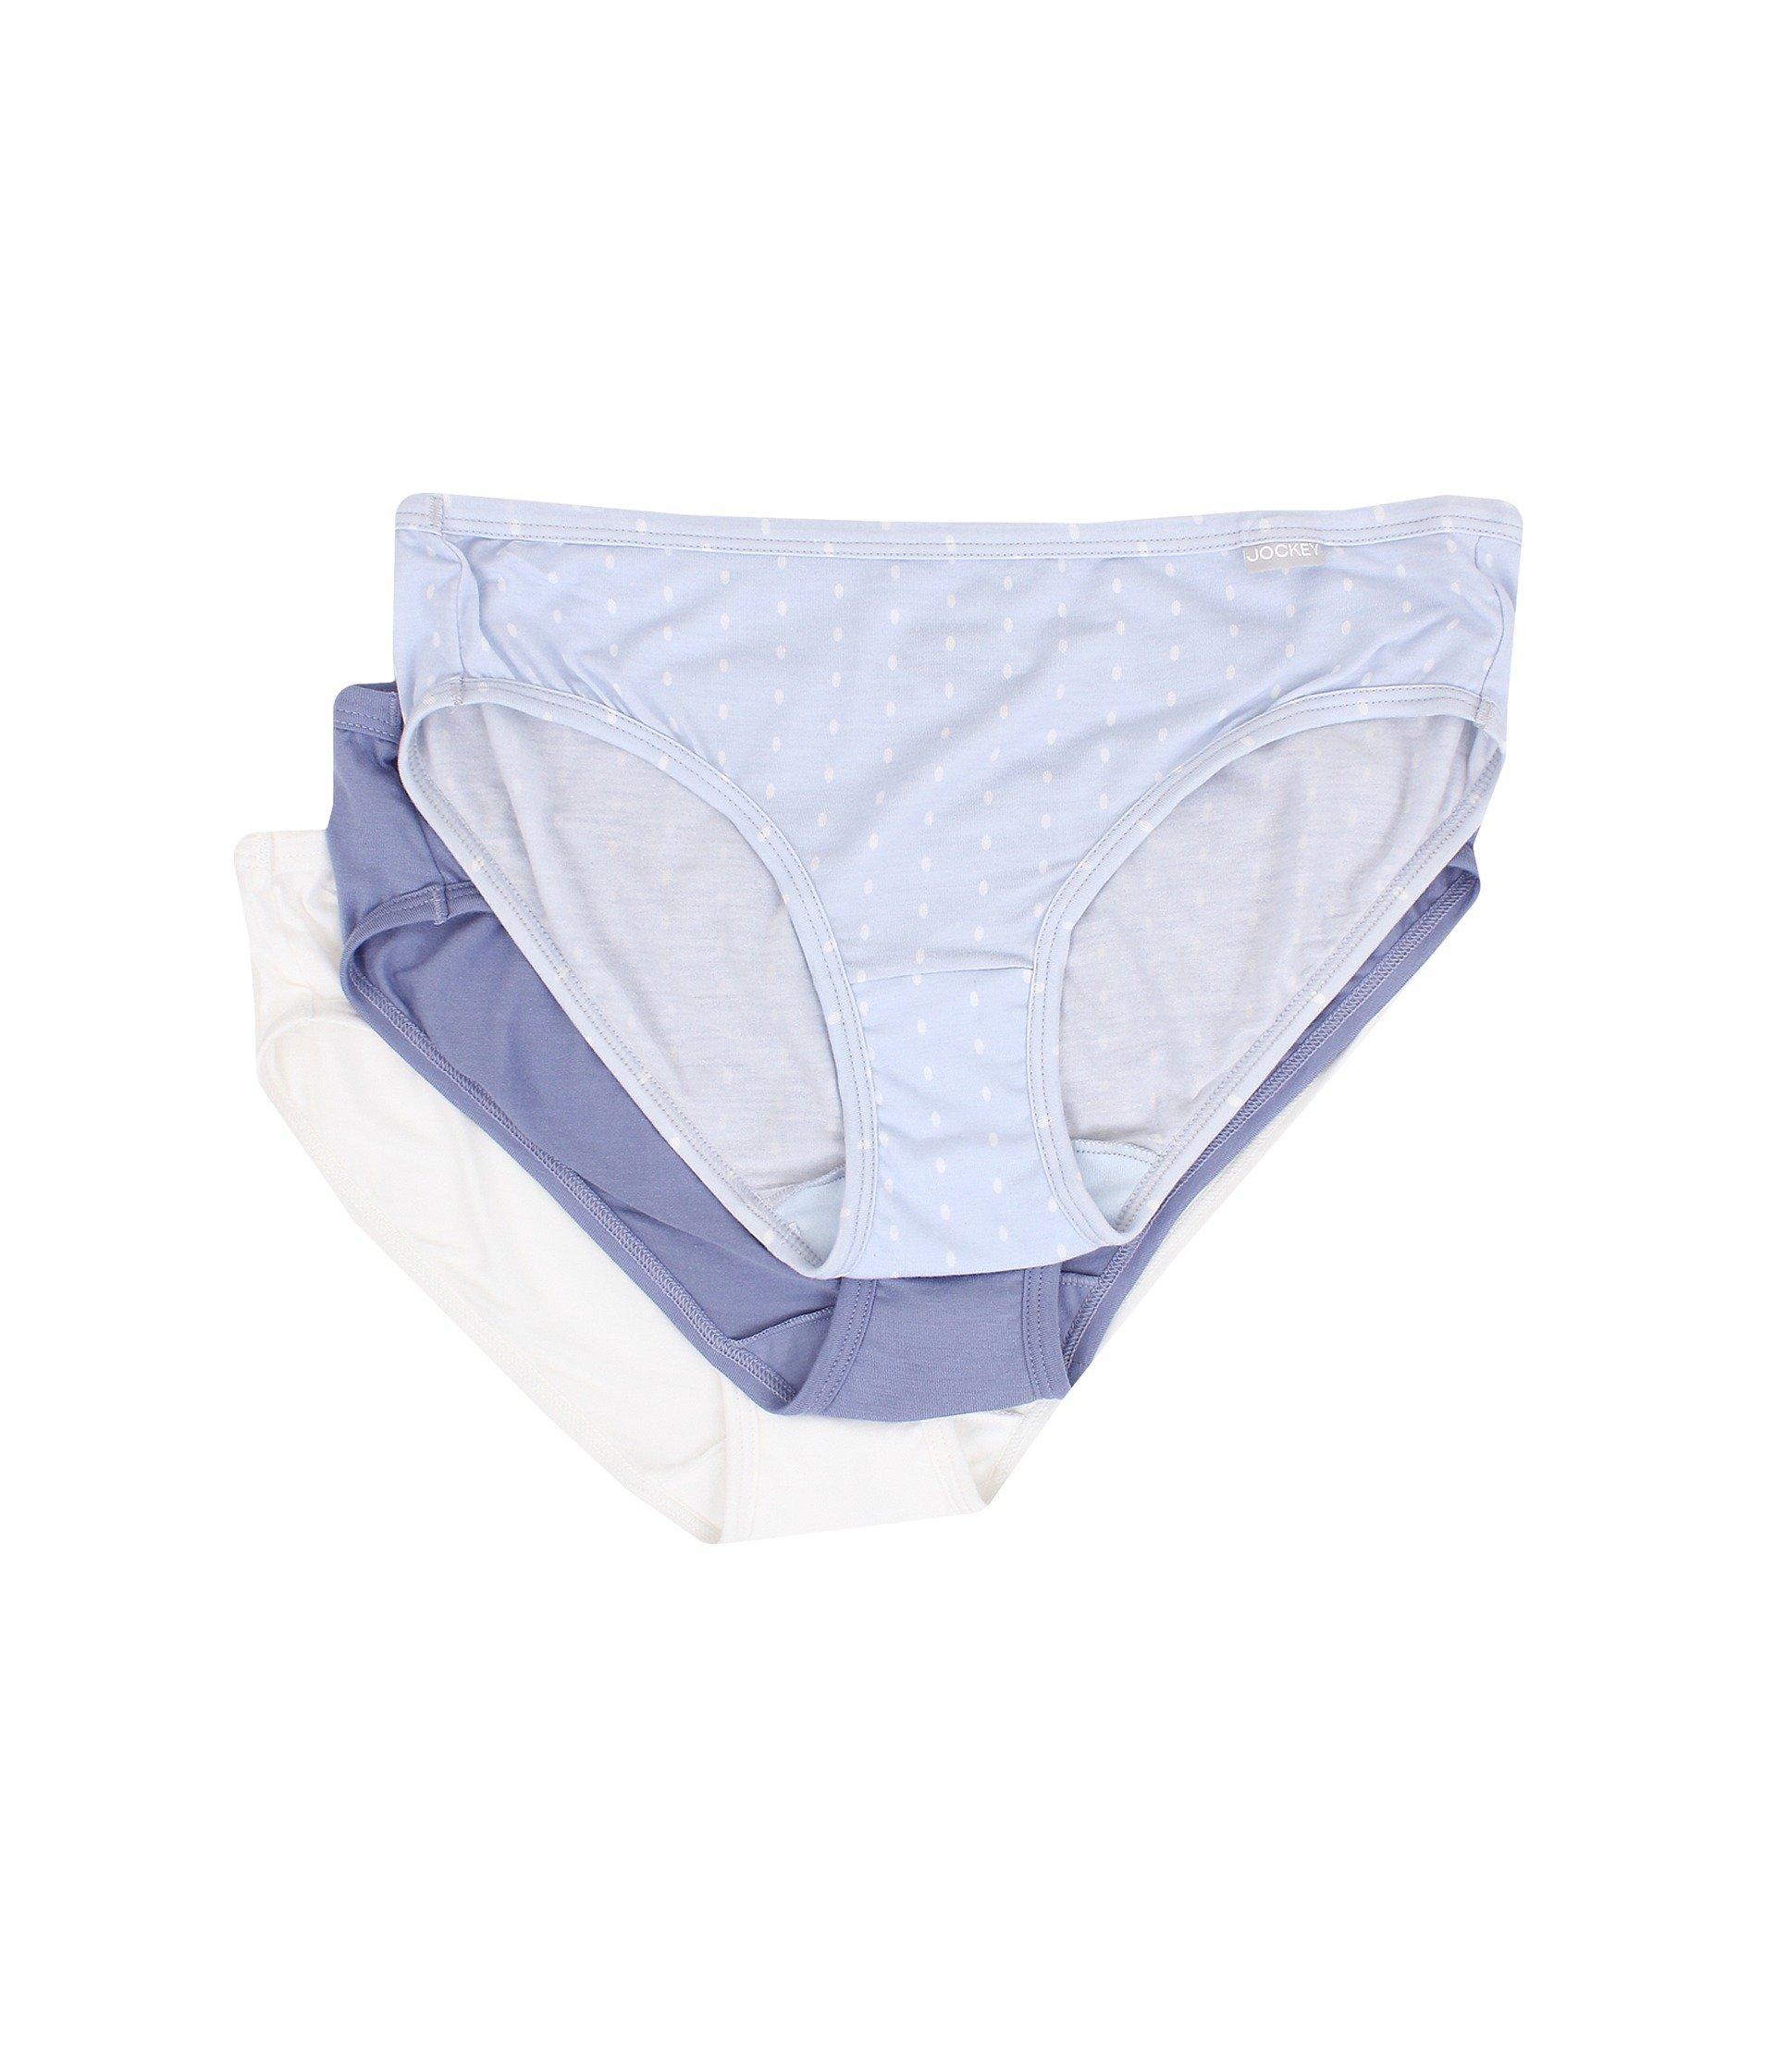 6154f8bc5e8dc7 Lyst - Jockey Elance® Supersoft Bikini 3-pack - Save 38%